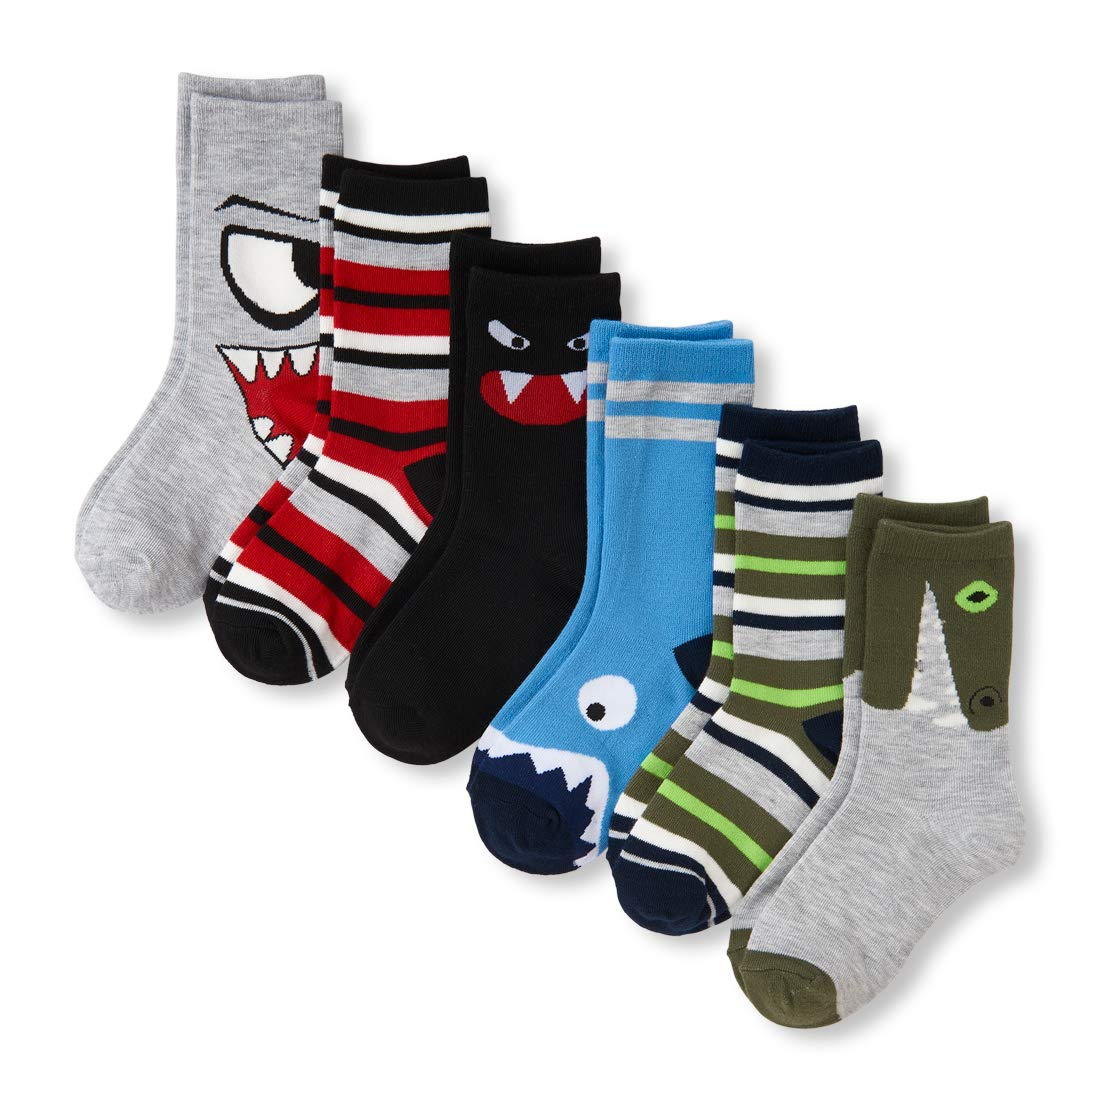 The Children's Place Big Boys' 6 Pack Fashion Crew Socks